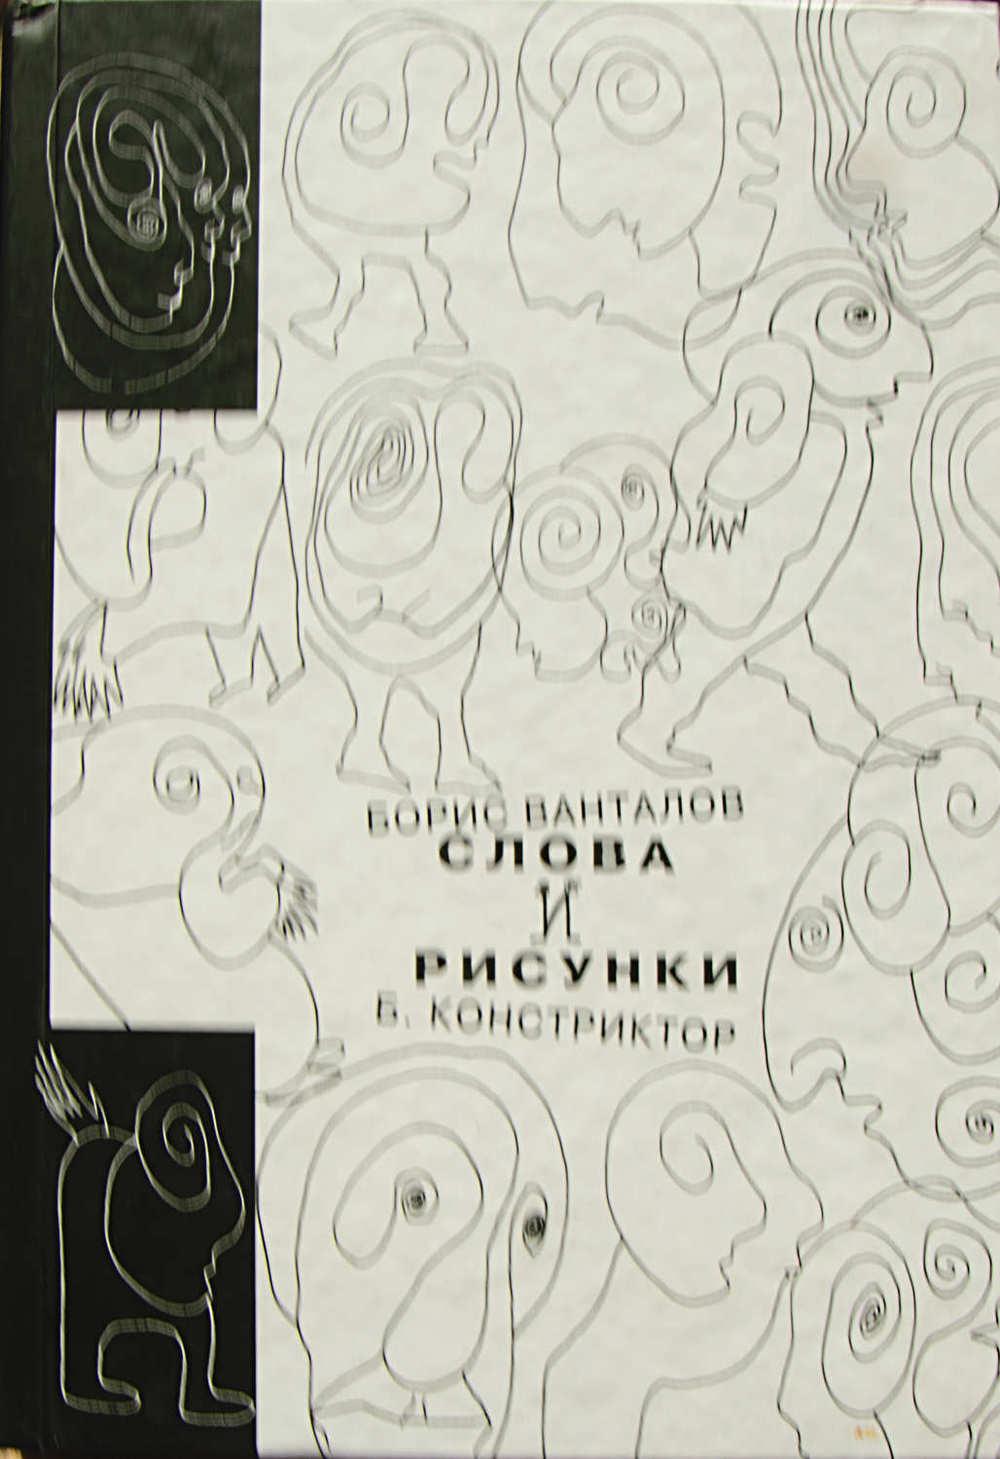 Слова и рисунки:Борис Ванталов, Борис Констриктор